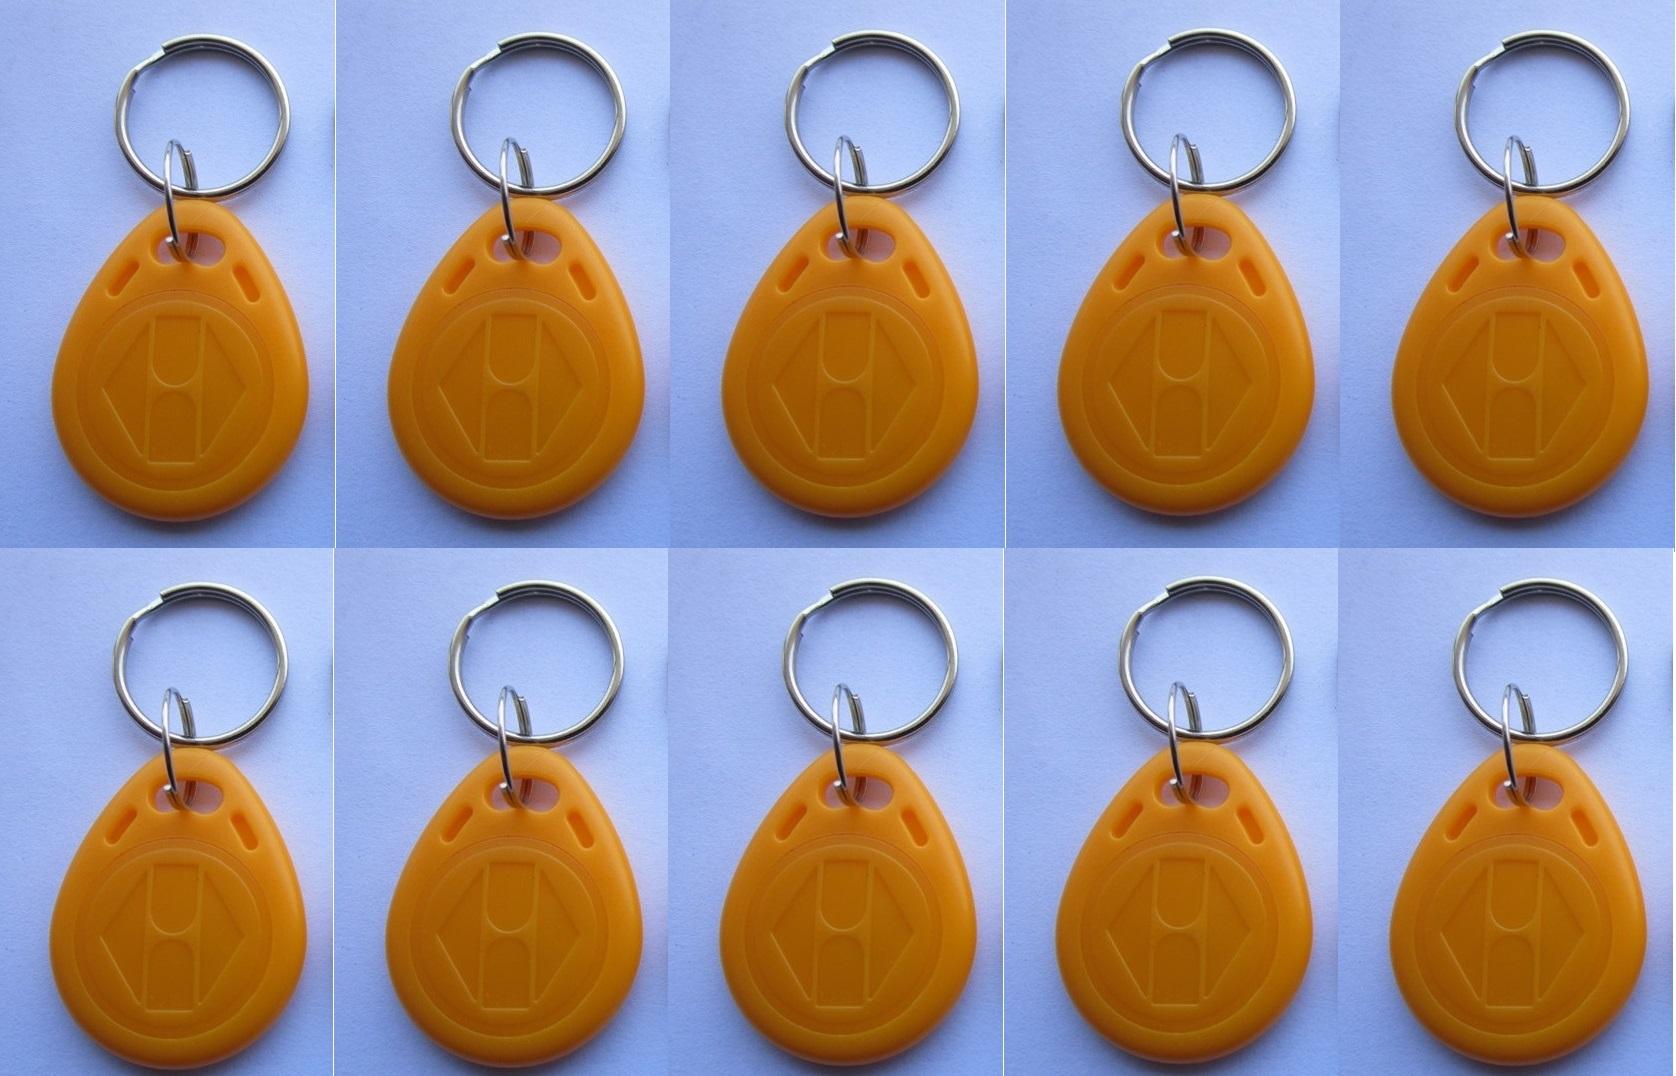 10 pcs EM4305 Copy Rewritable Writable Rewrite EM ID keyfobs RFID Tag Key  Ring Card 125KHZ Proximity Token Access Duplicate - Eclats Antivols